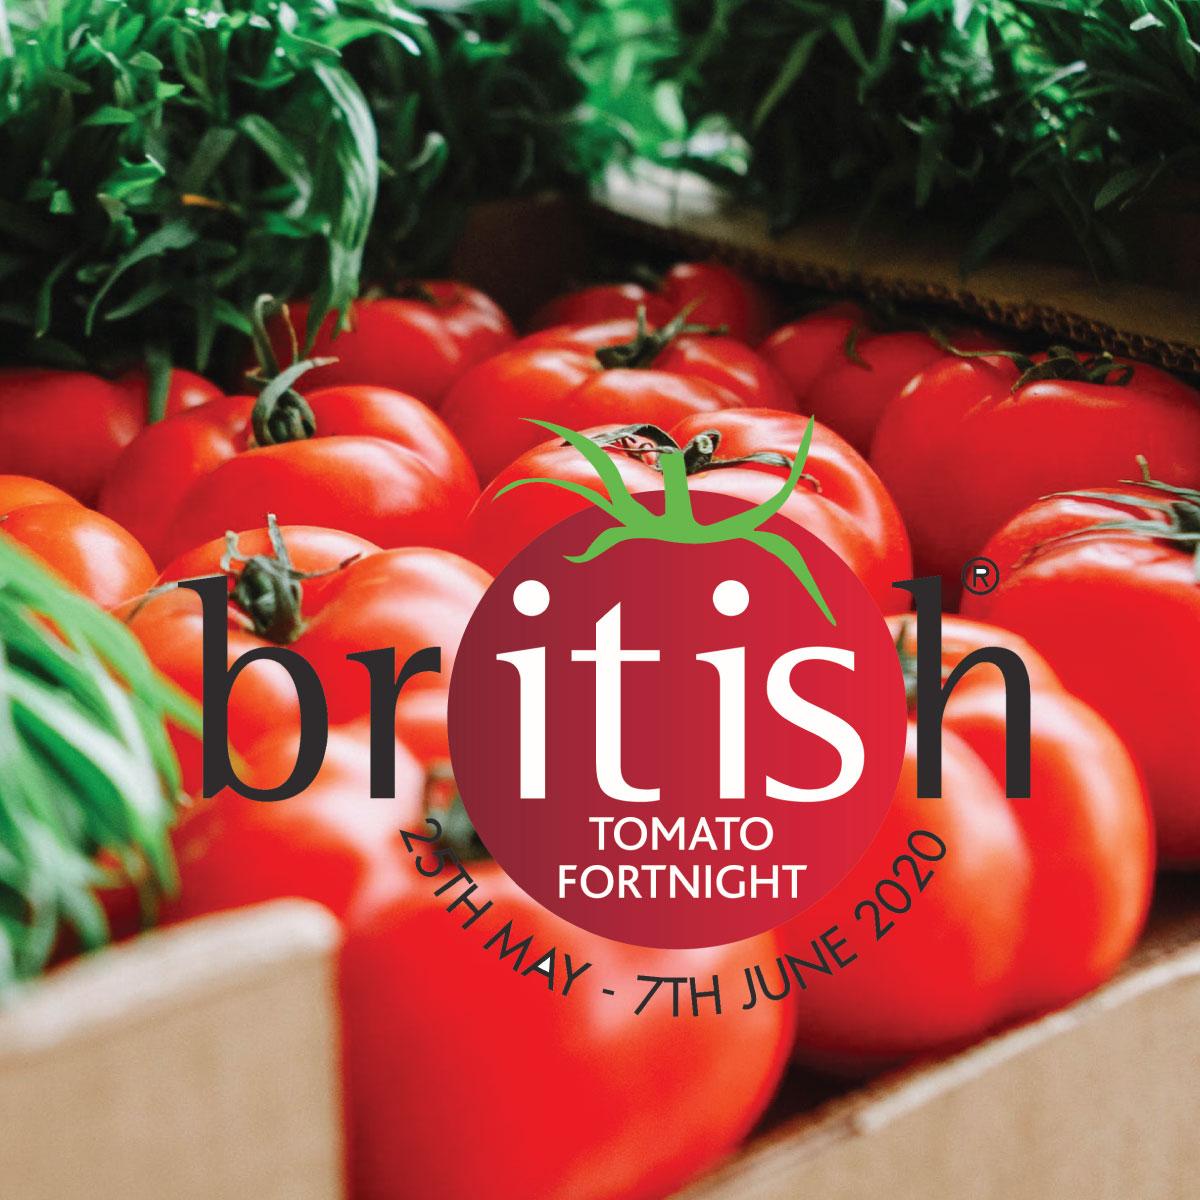 British Tomato Fortnight 2020 at Flavourfresh